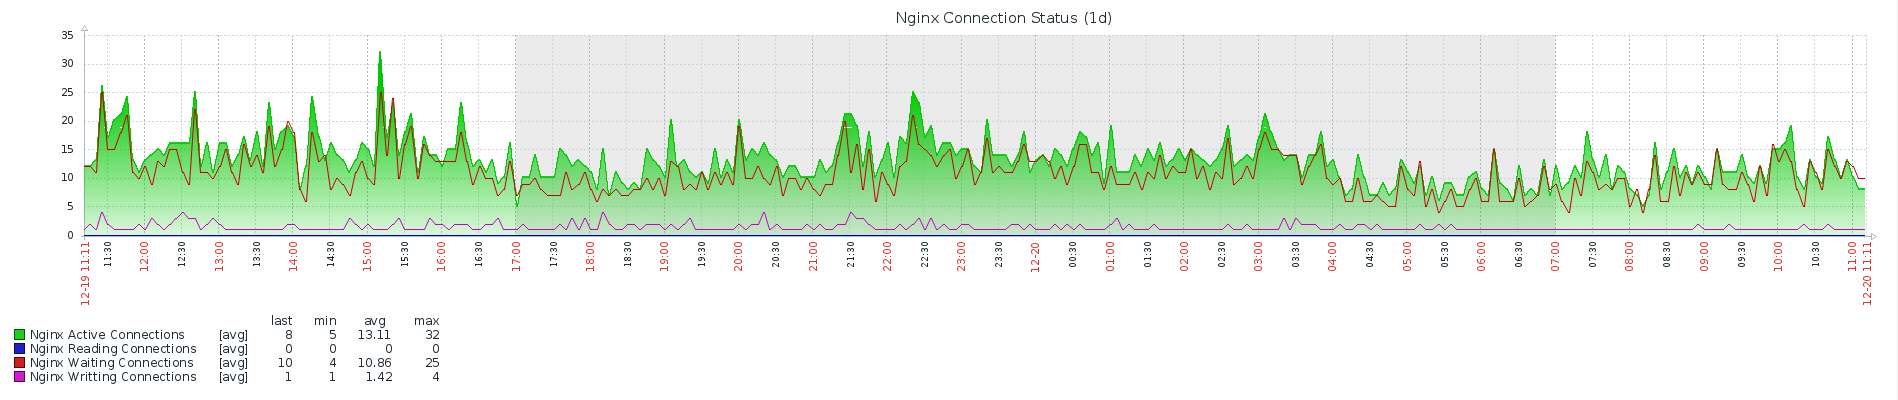 Connection Statistics